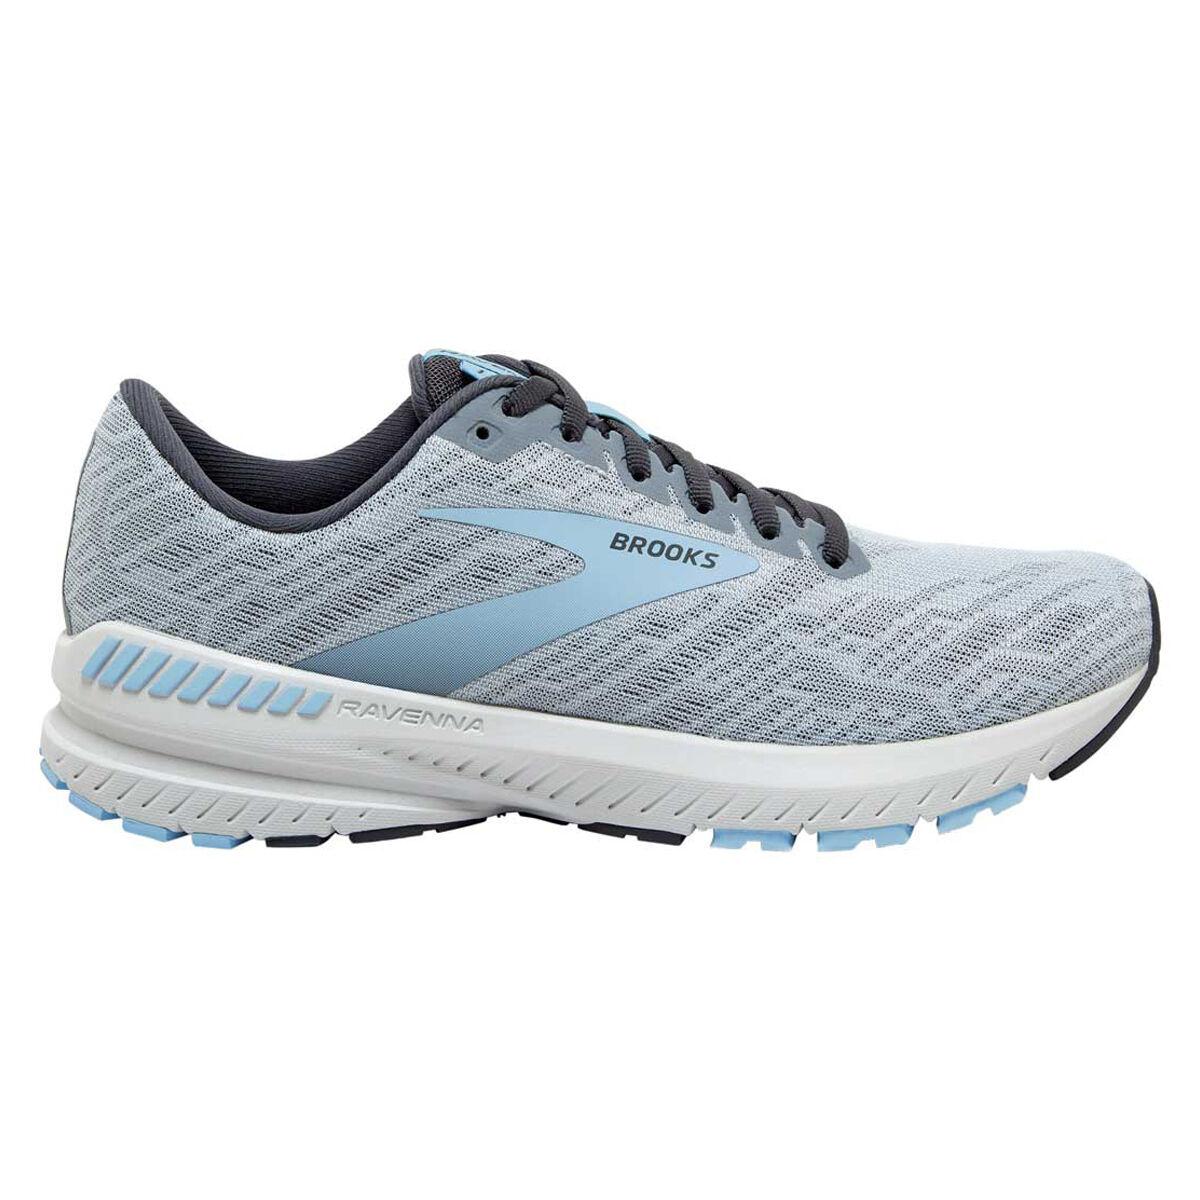 Brooks Ravenna 11 Womens Running Shoes